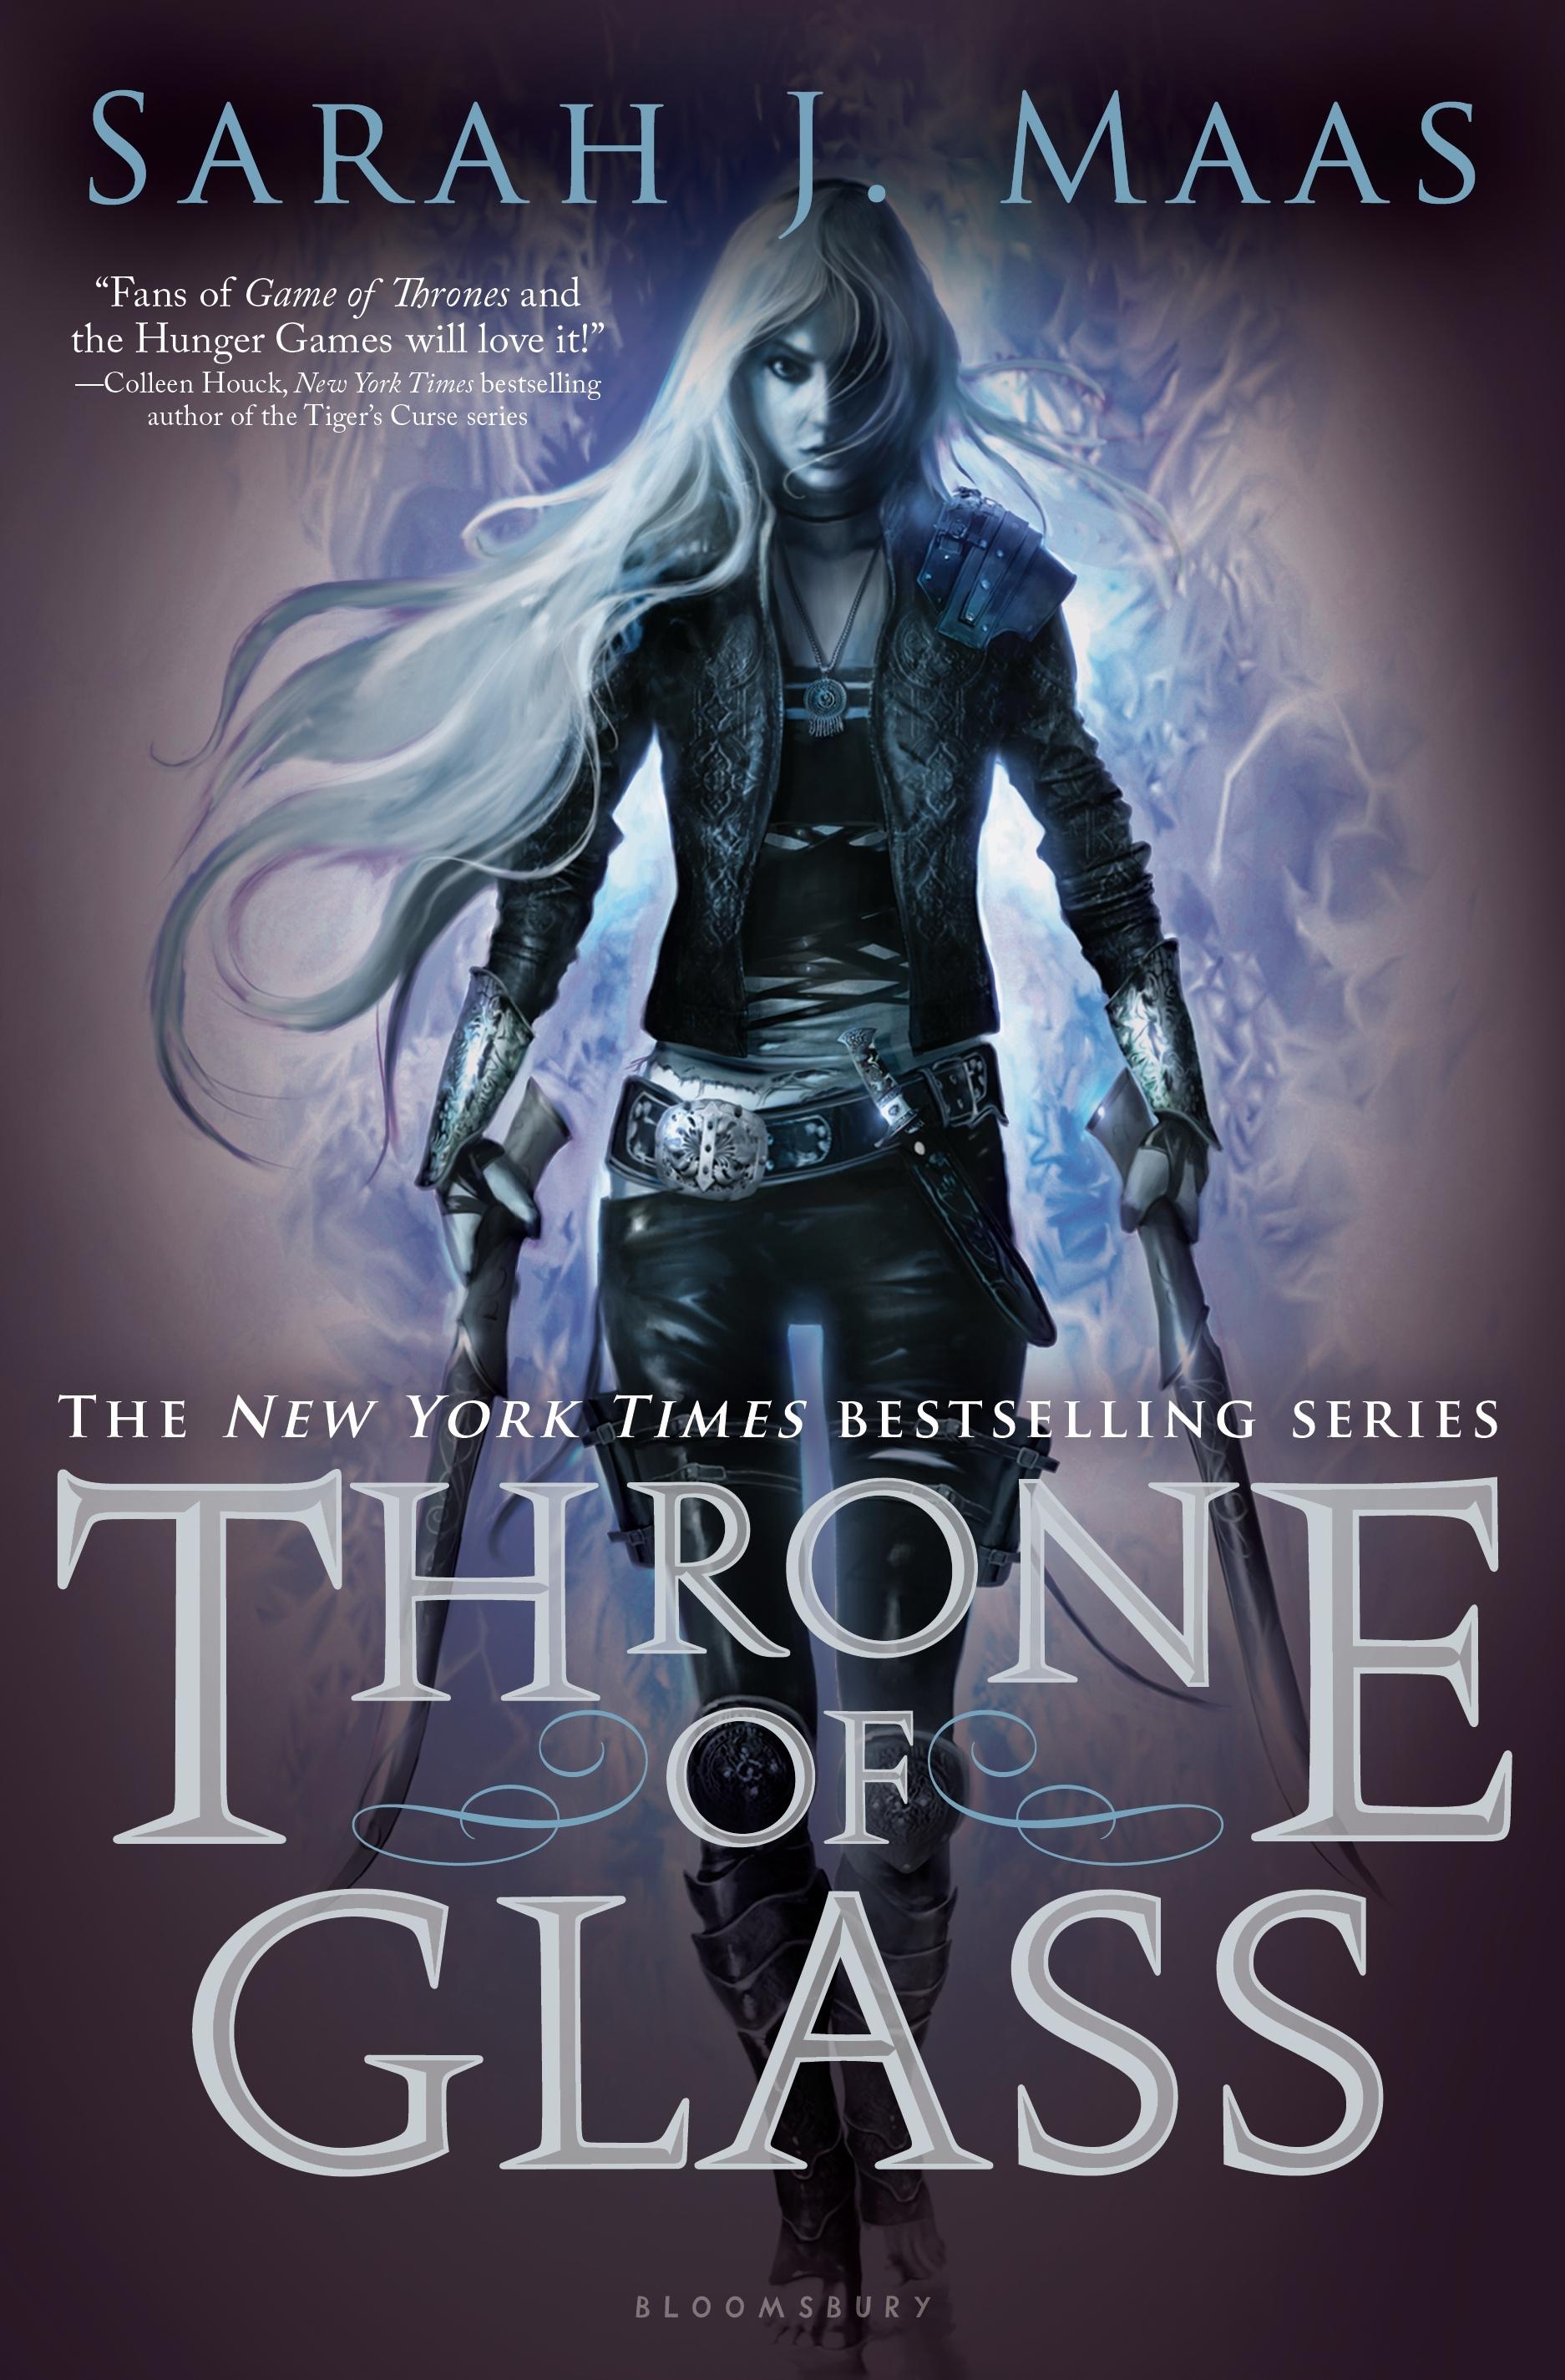 Throne of Glass , by Sarah J. Maas